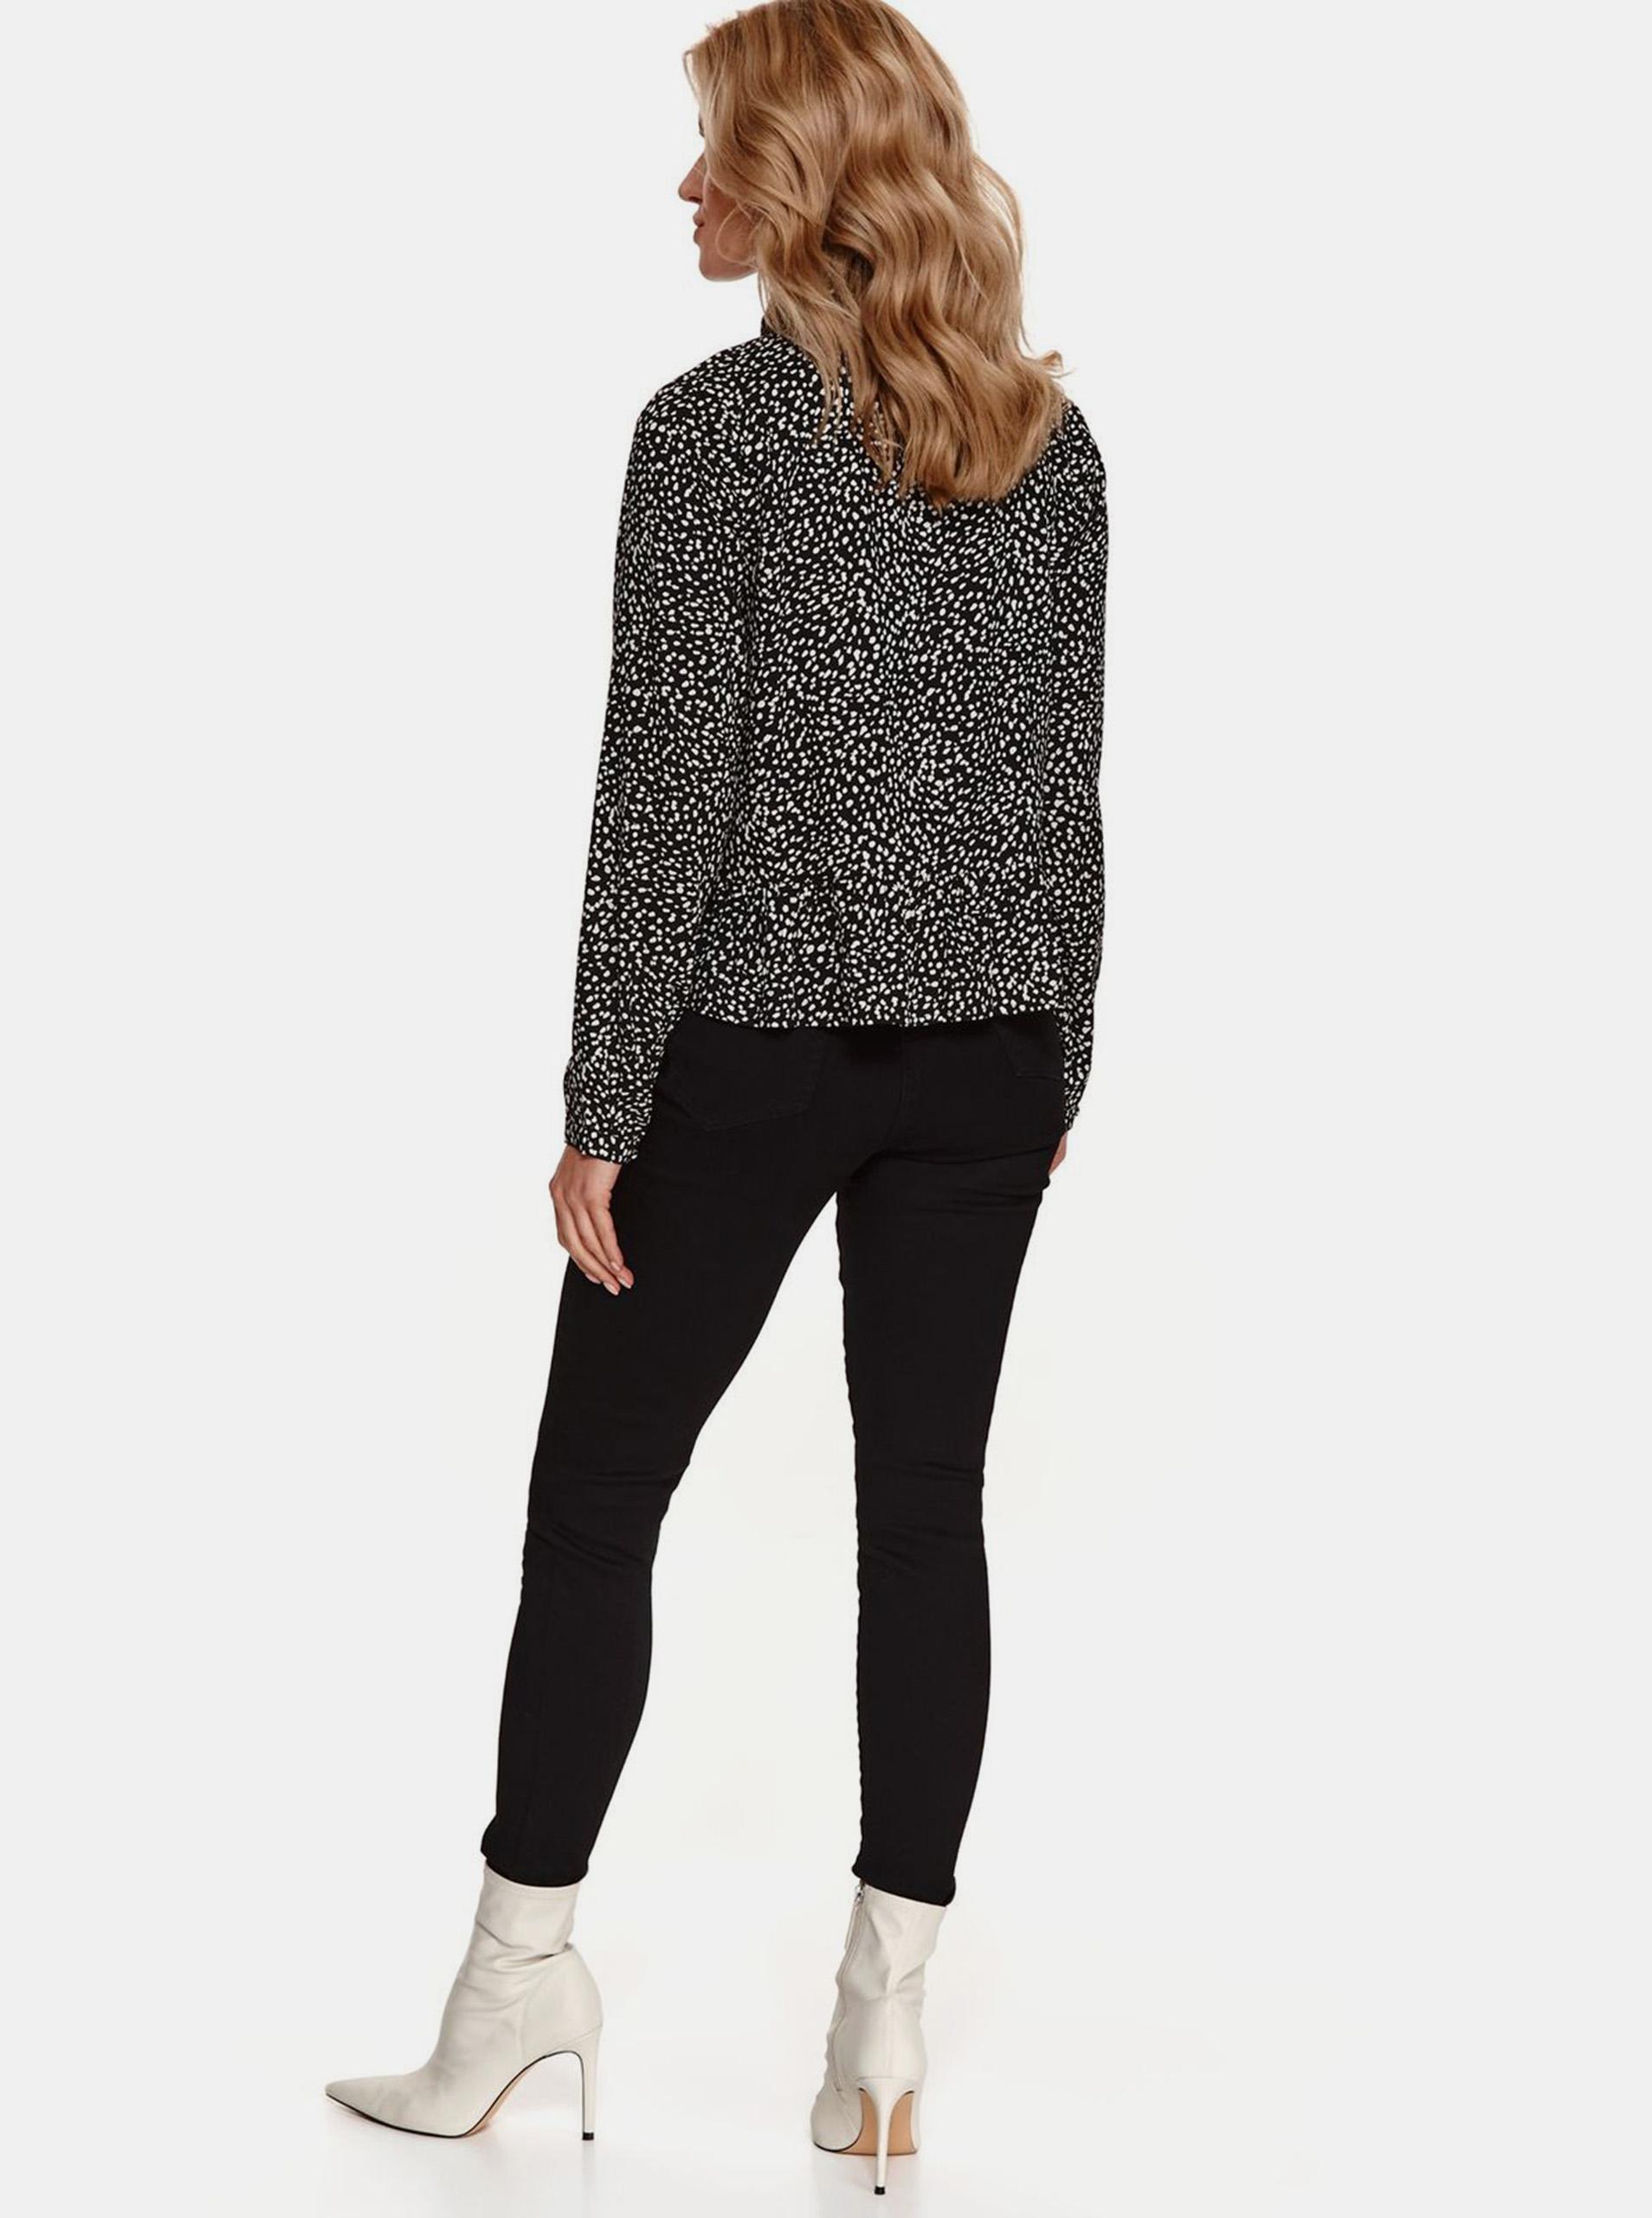 TOP SECRET black blouse with pattern